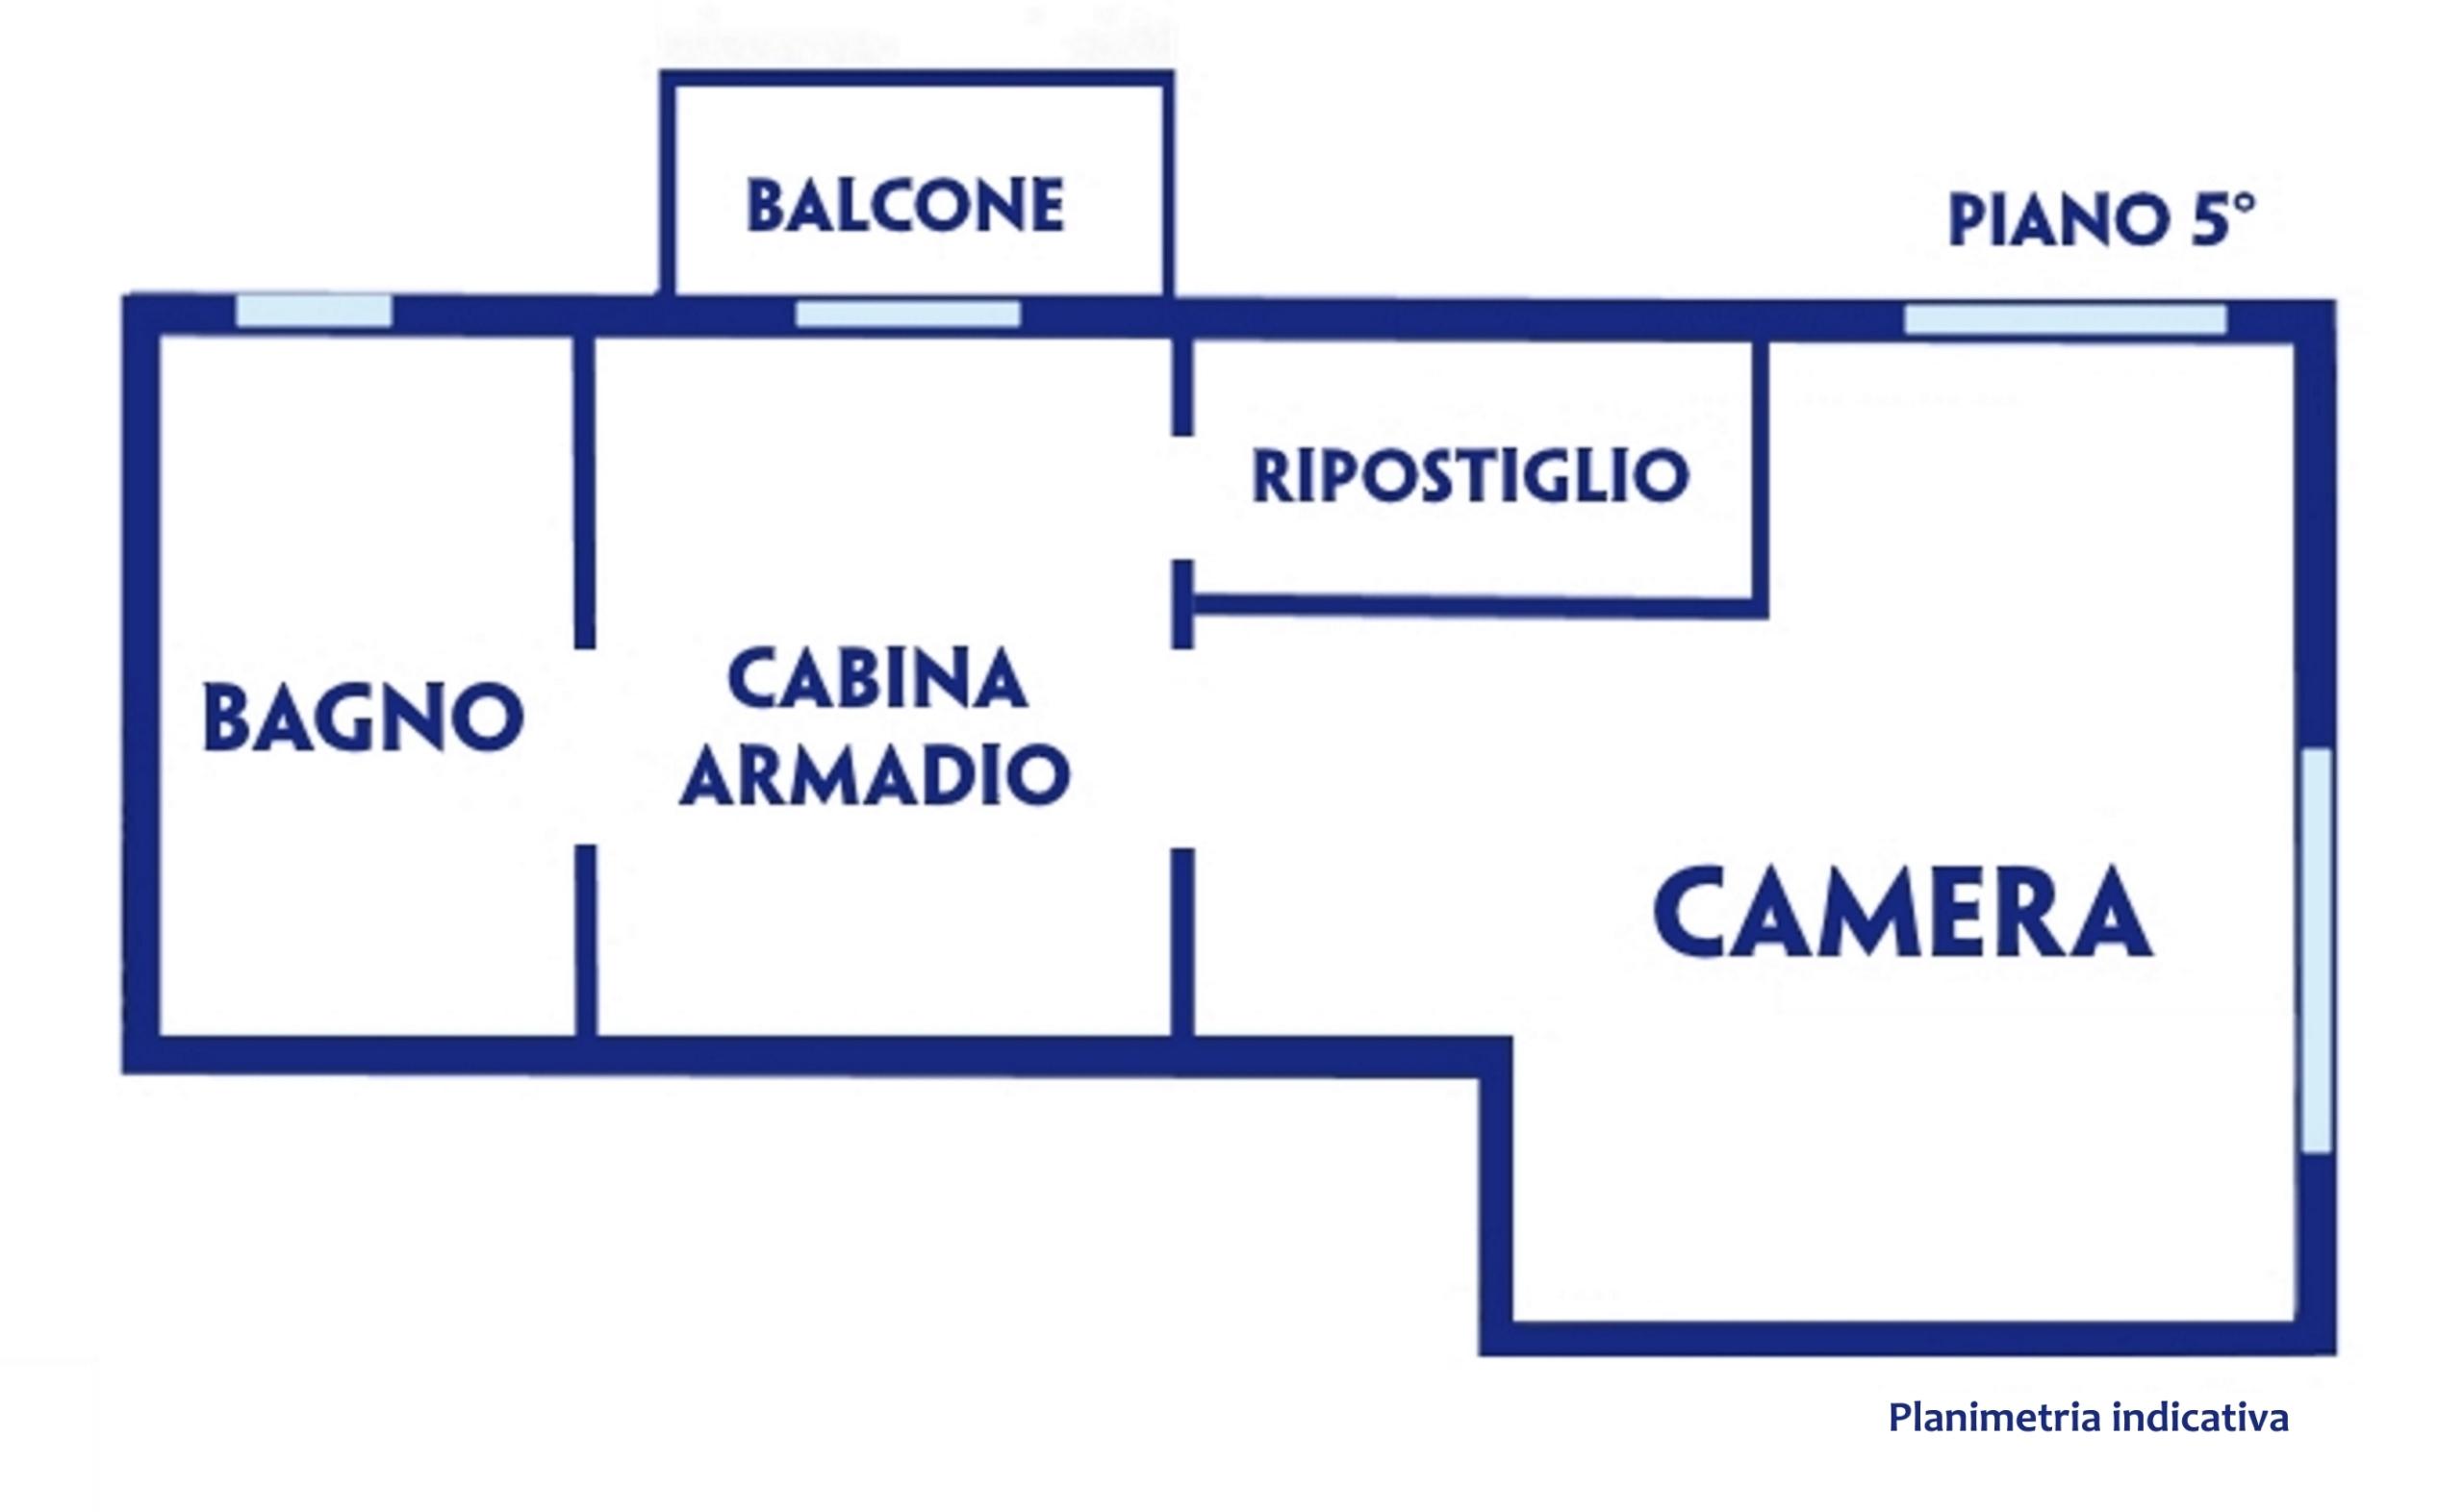 Planimetria Piano 5° (notte)